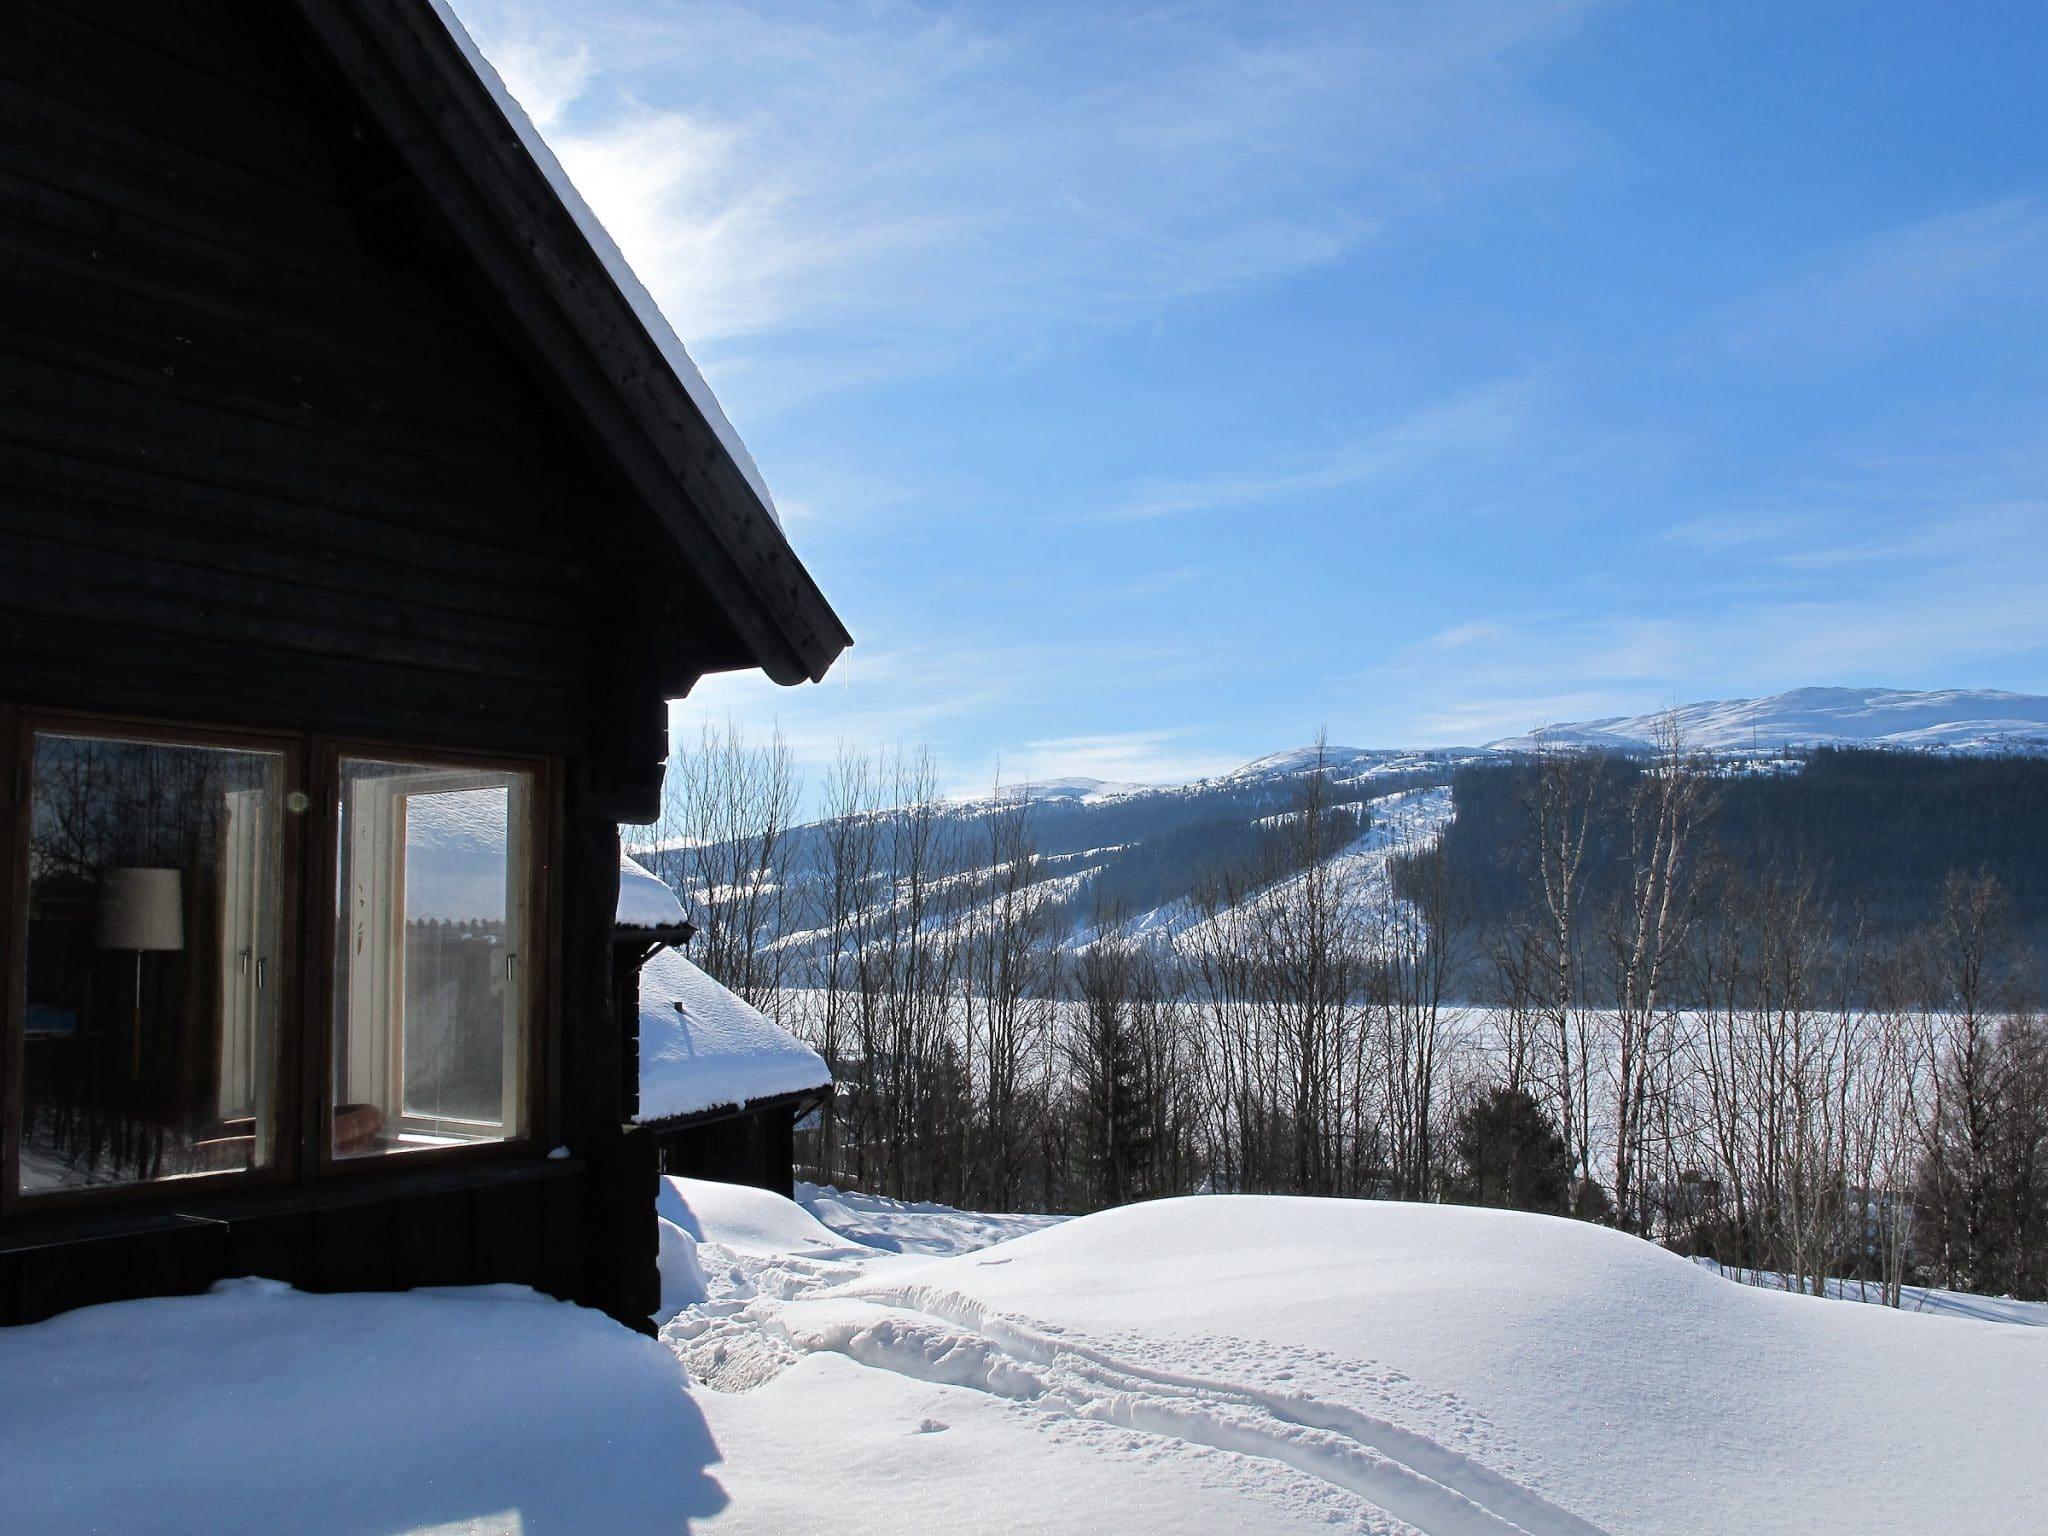 Vy från Skutan Ski Lodge i Åre vintertid